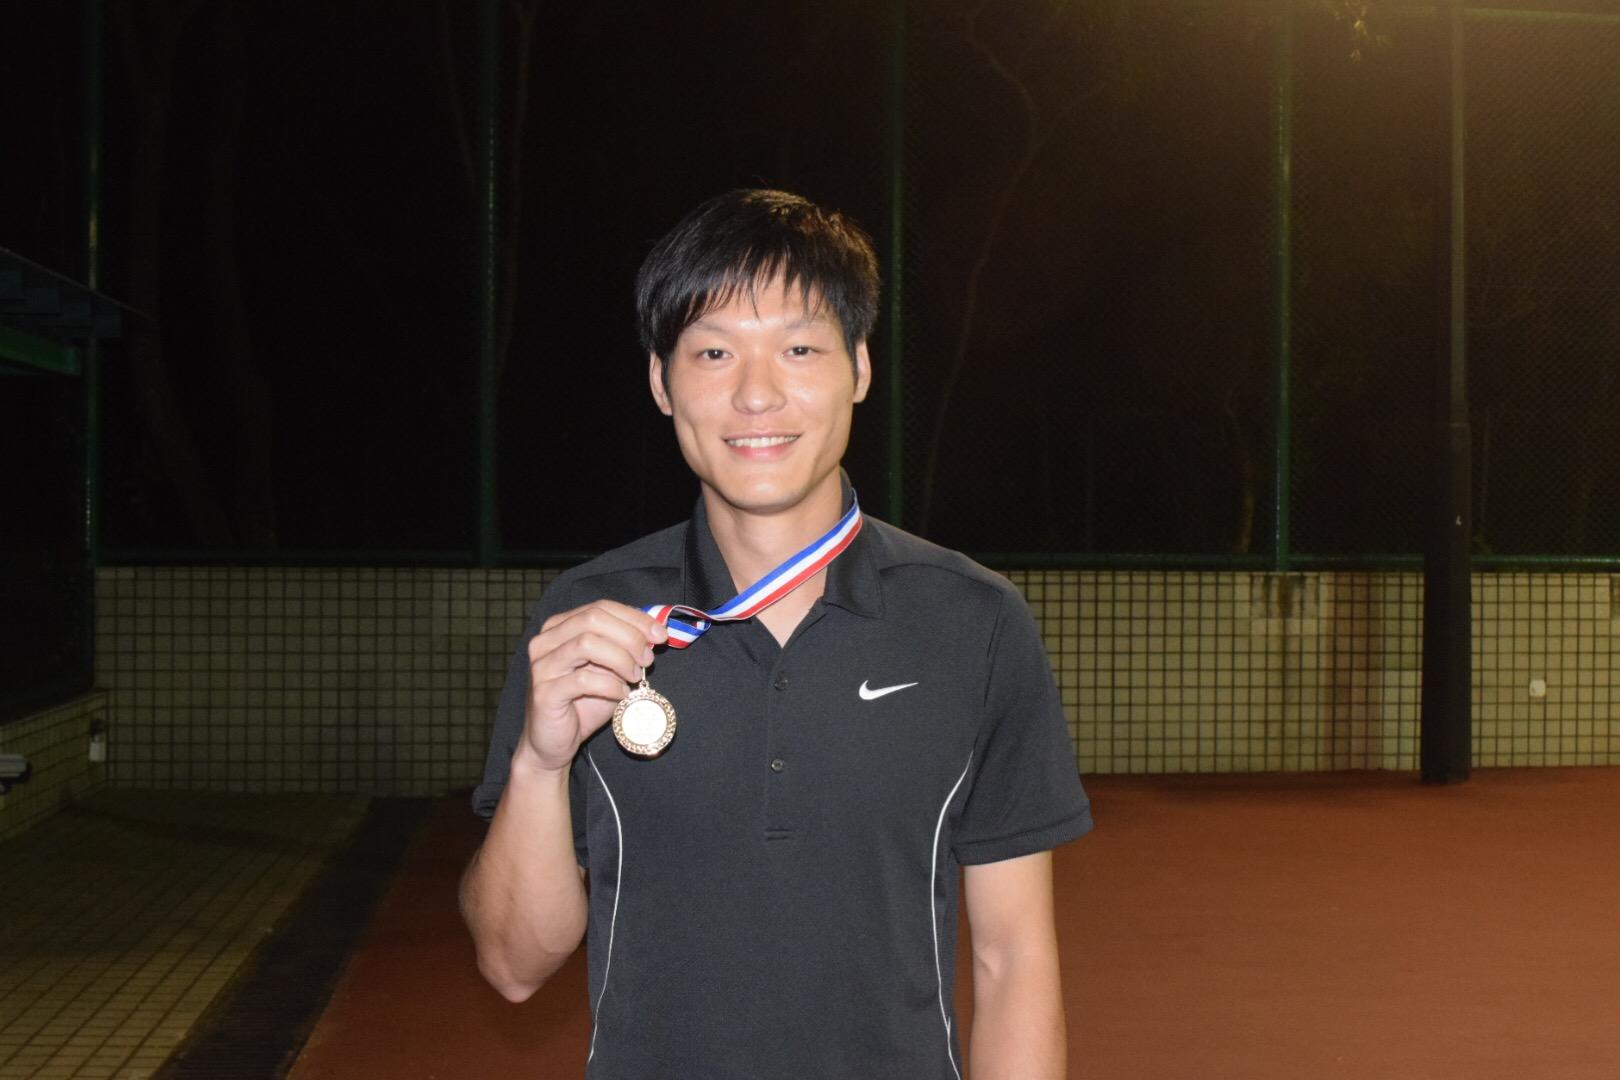 Lee Ting Yu